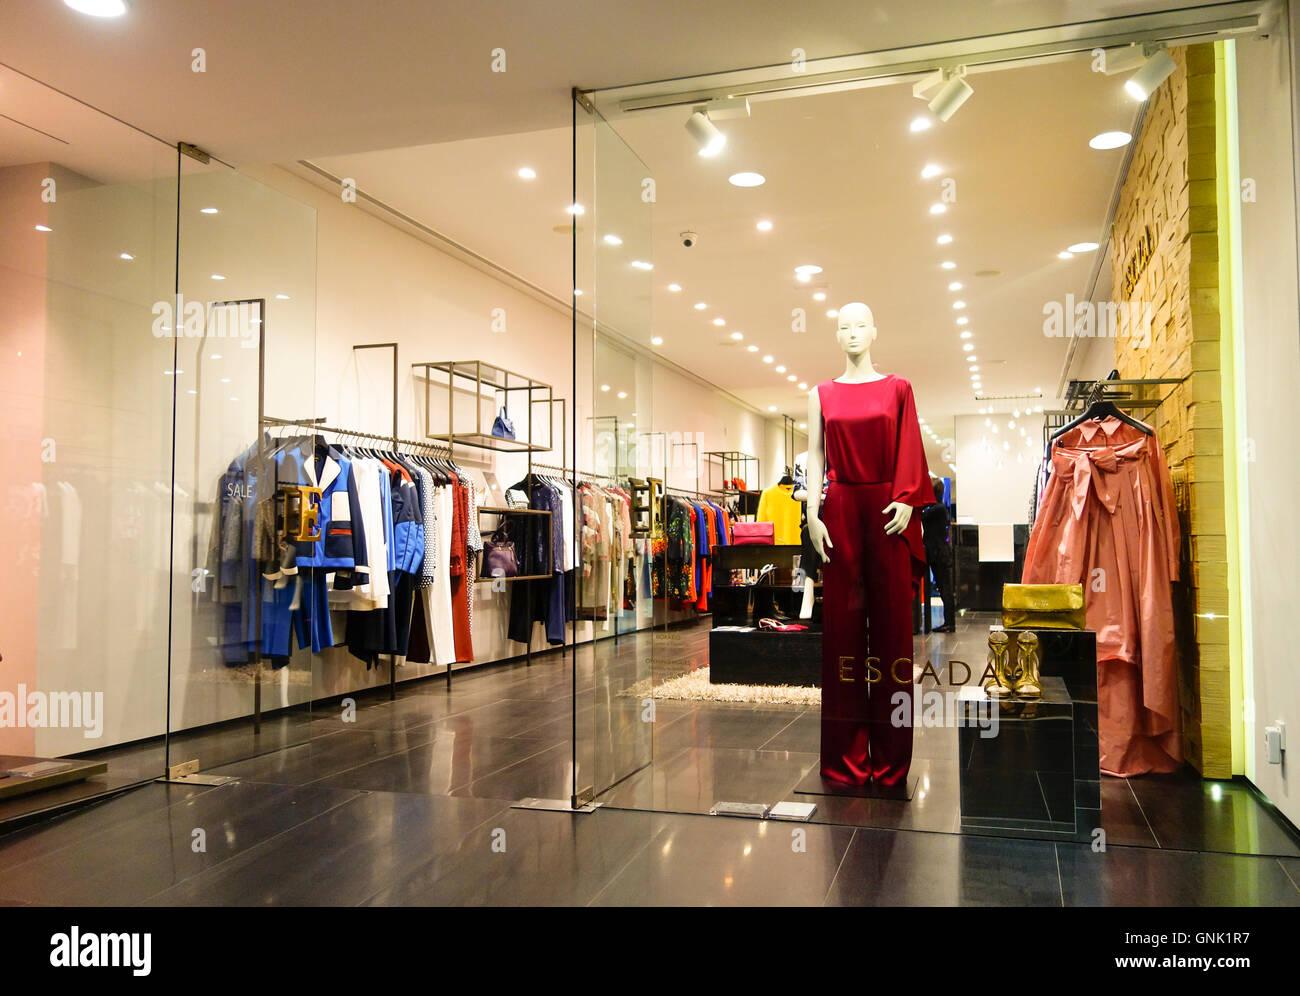 Deutsche Frauen Designer-Kleidung Firma, Geschäft, Mode, Escada Fassade,  Puerto Banus 594c2d0251